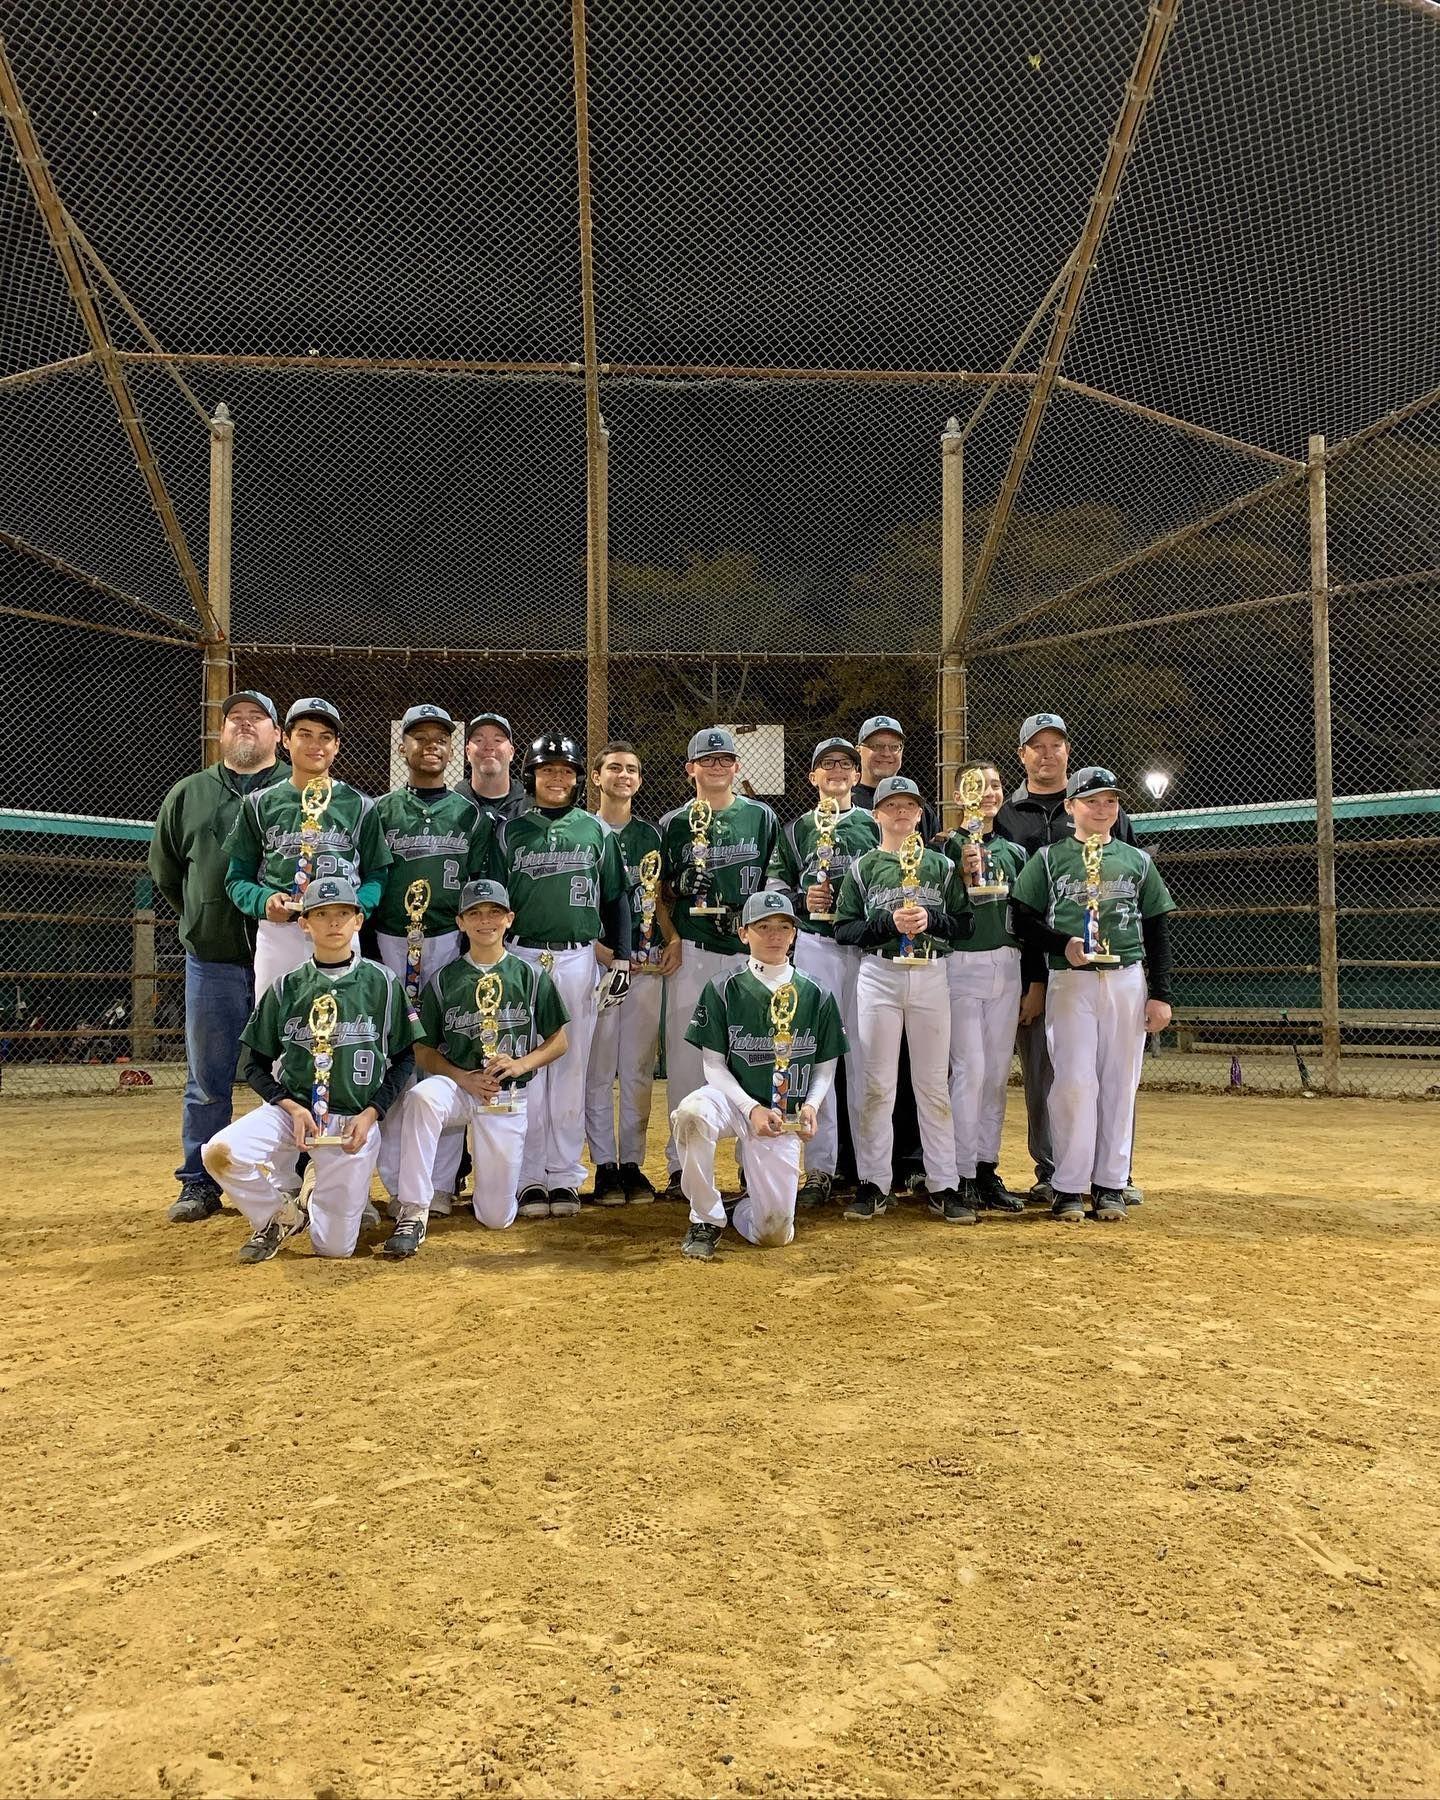 Fall Series 13u National Champions Farmingdale Greendogs In 2020 National Champions Youth Sports Fallen Series